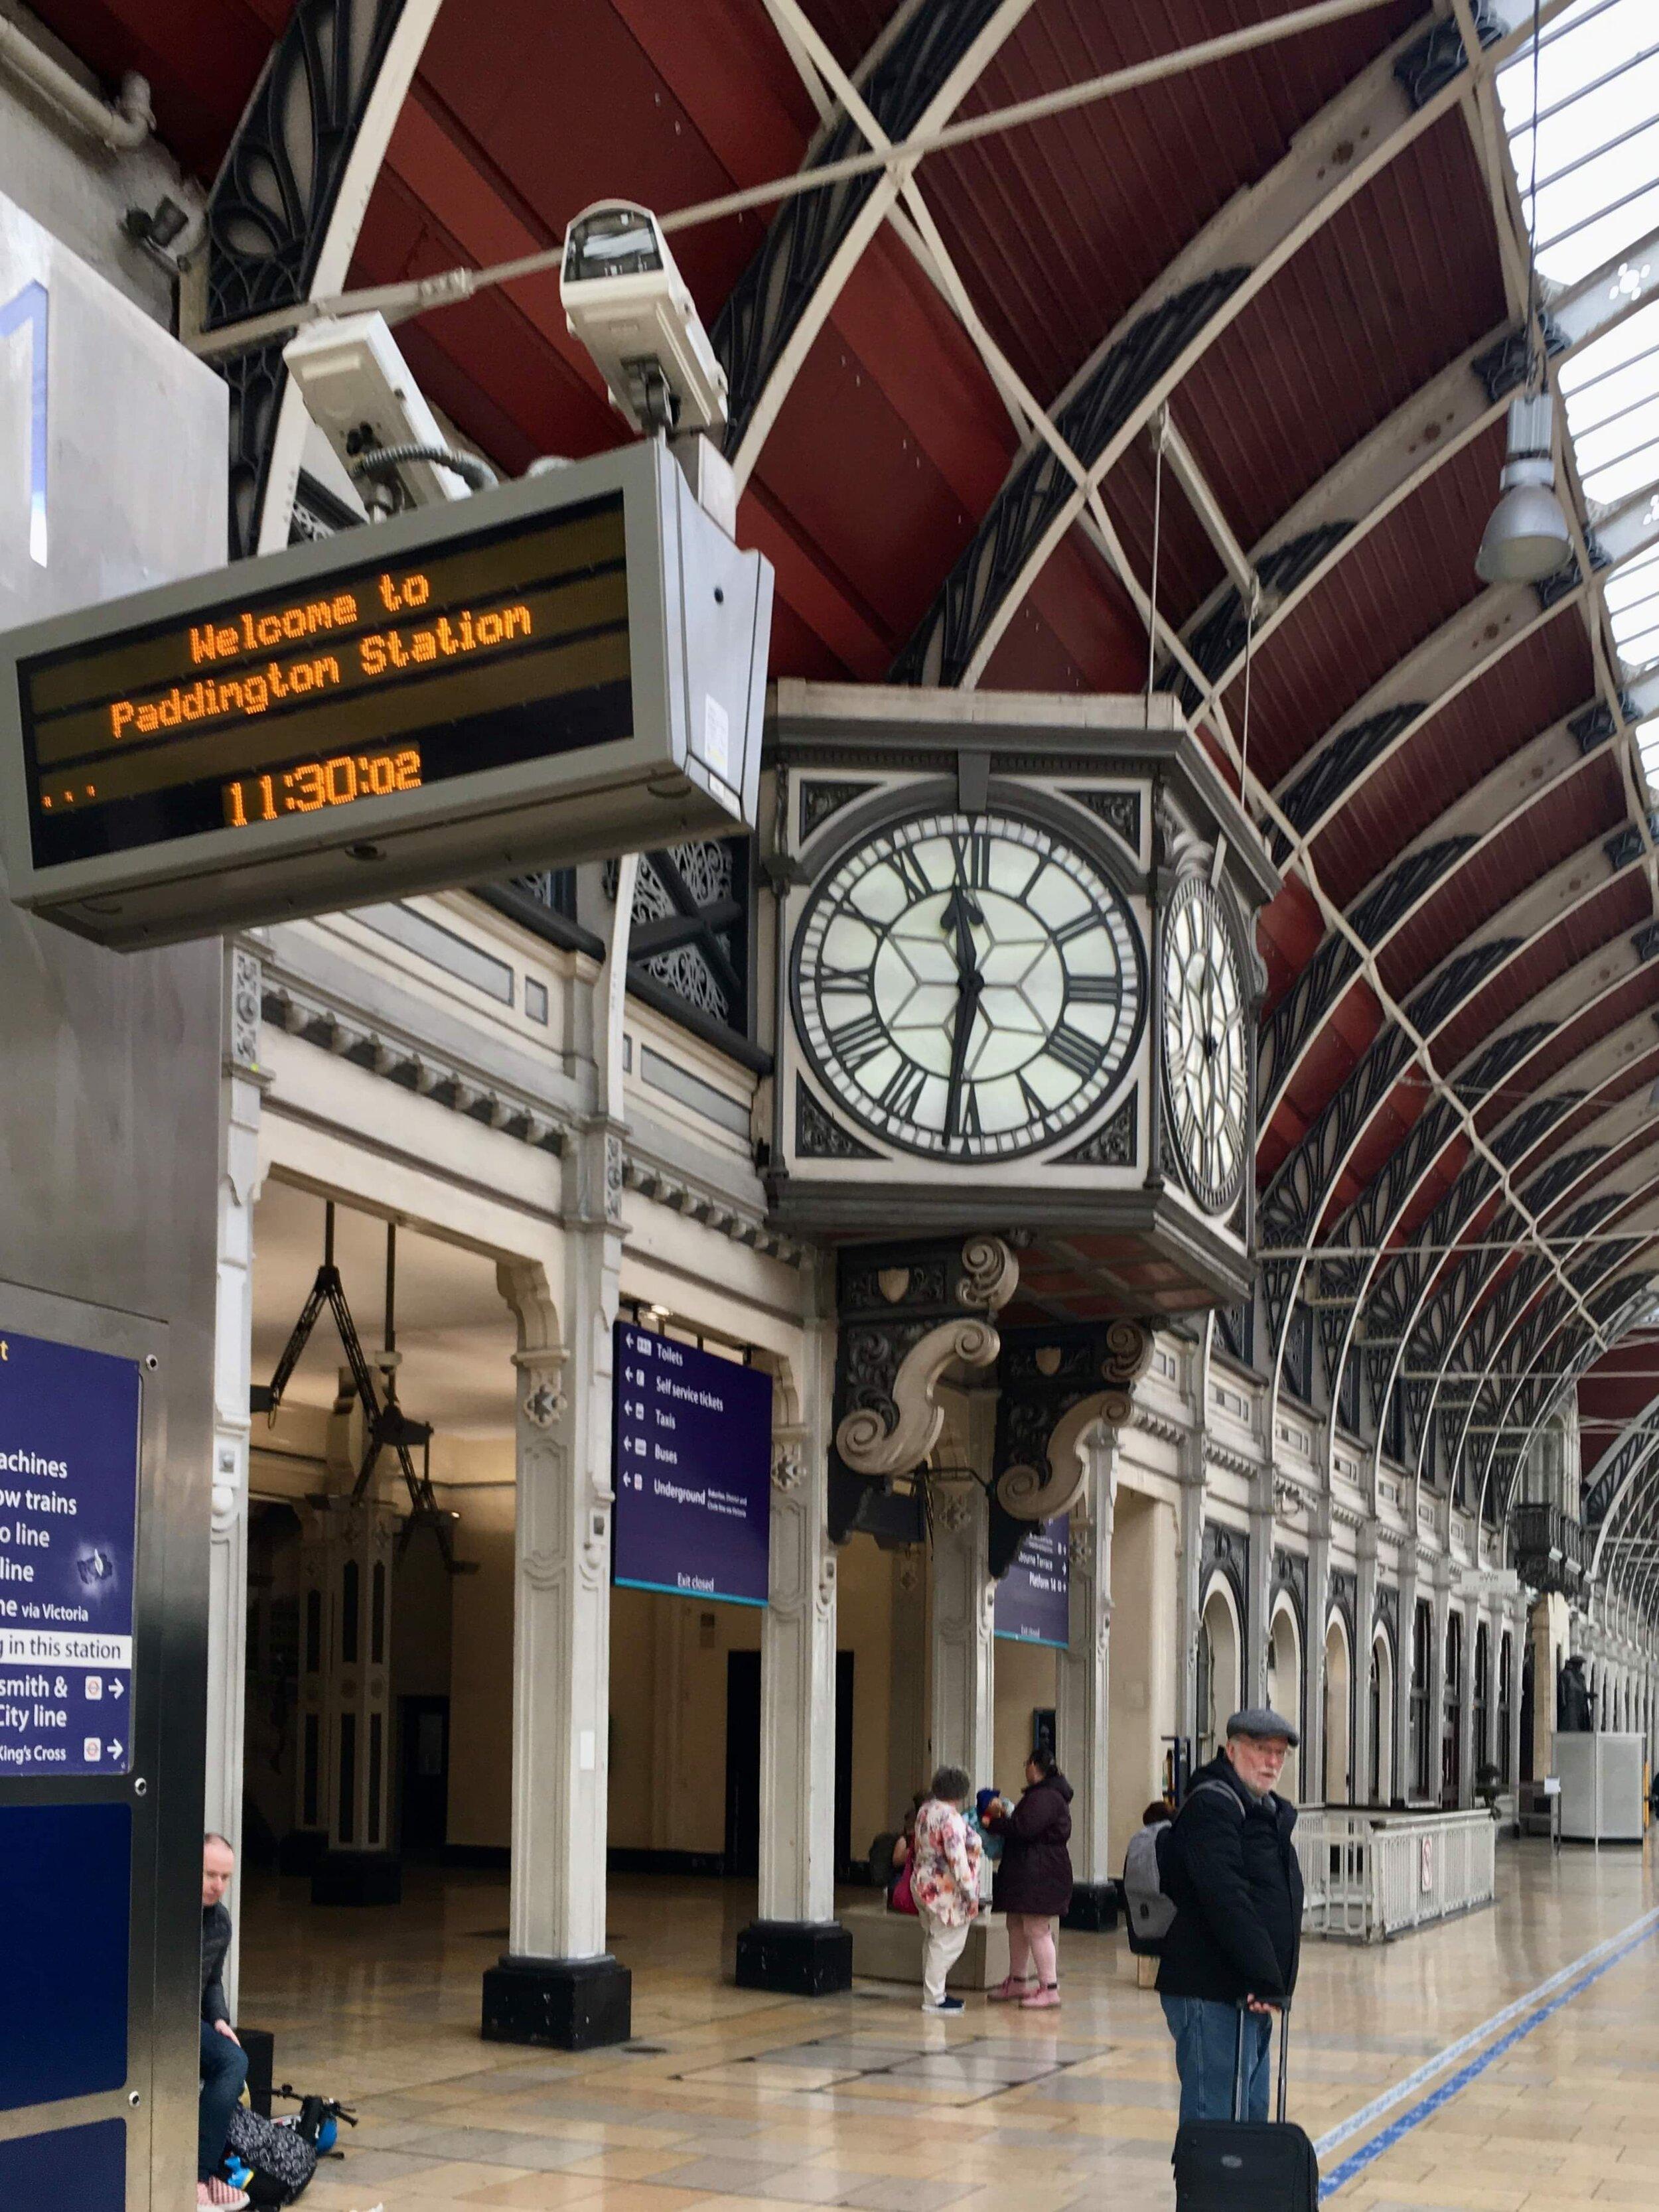 Paddington Station was full of promise that morning